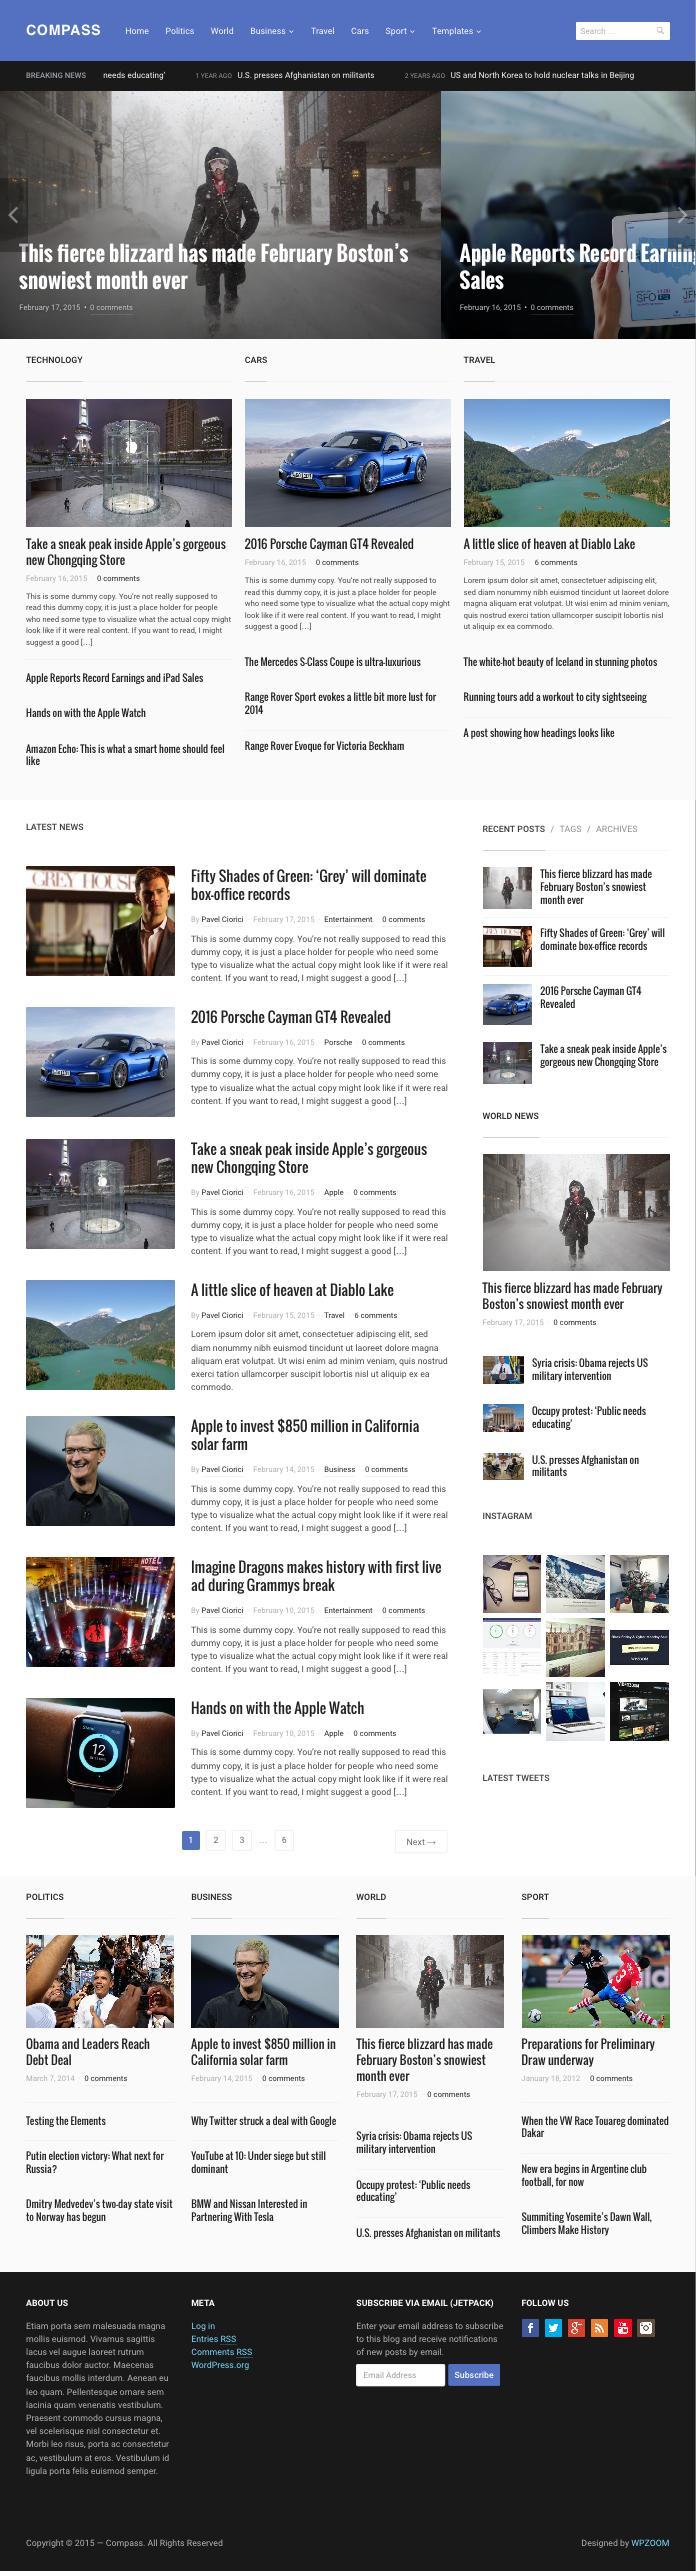 Compass WordPress Magazine Style Theme